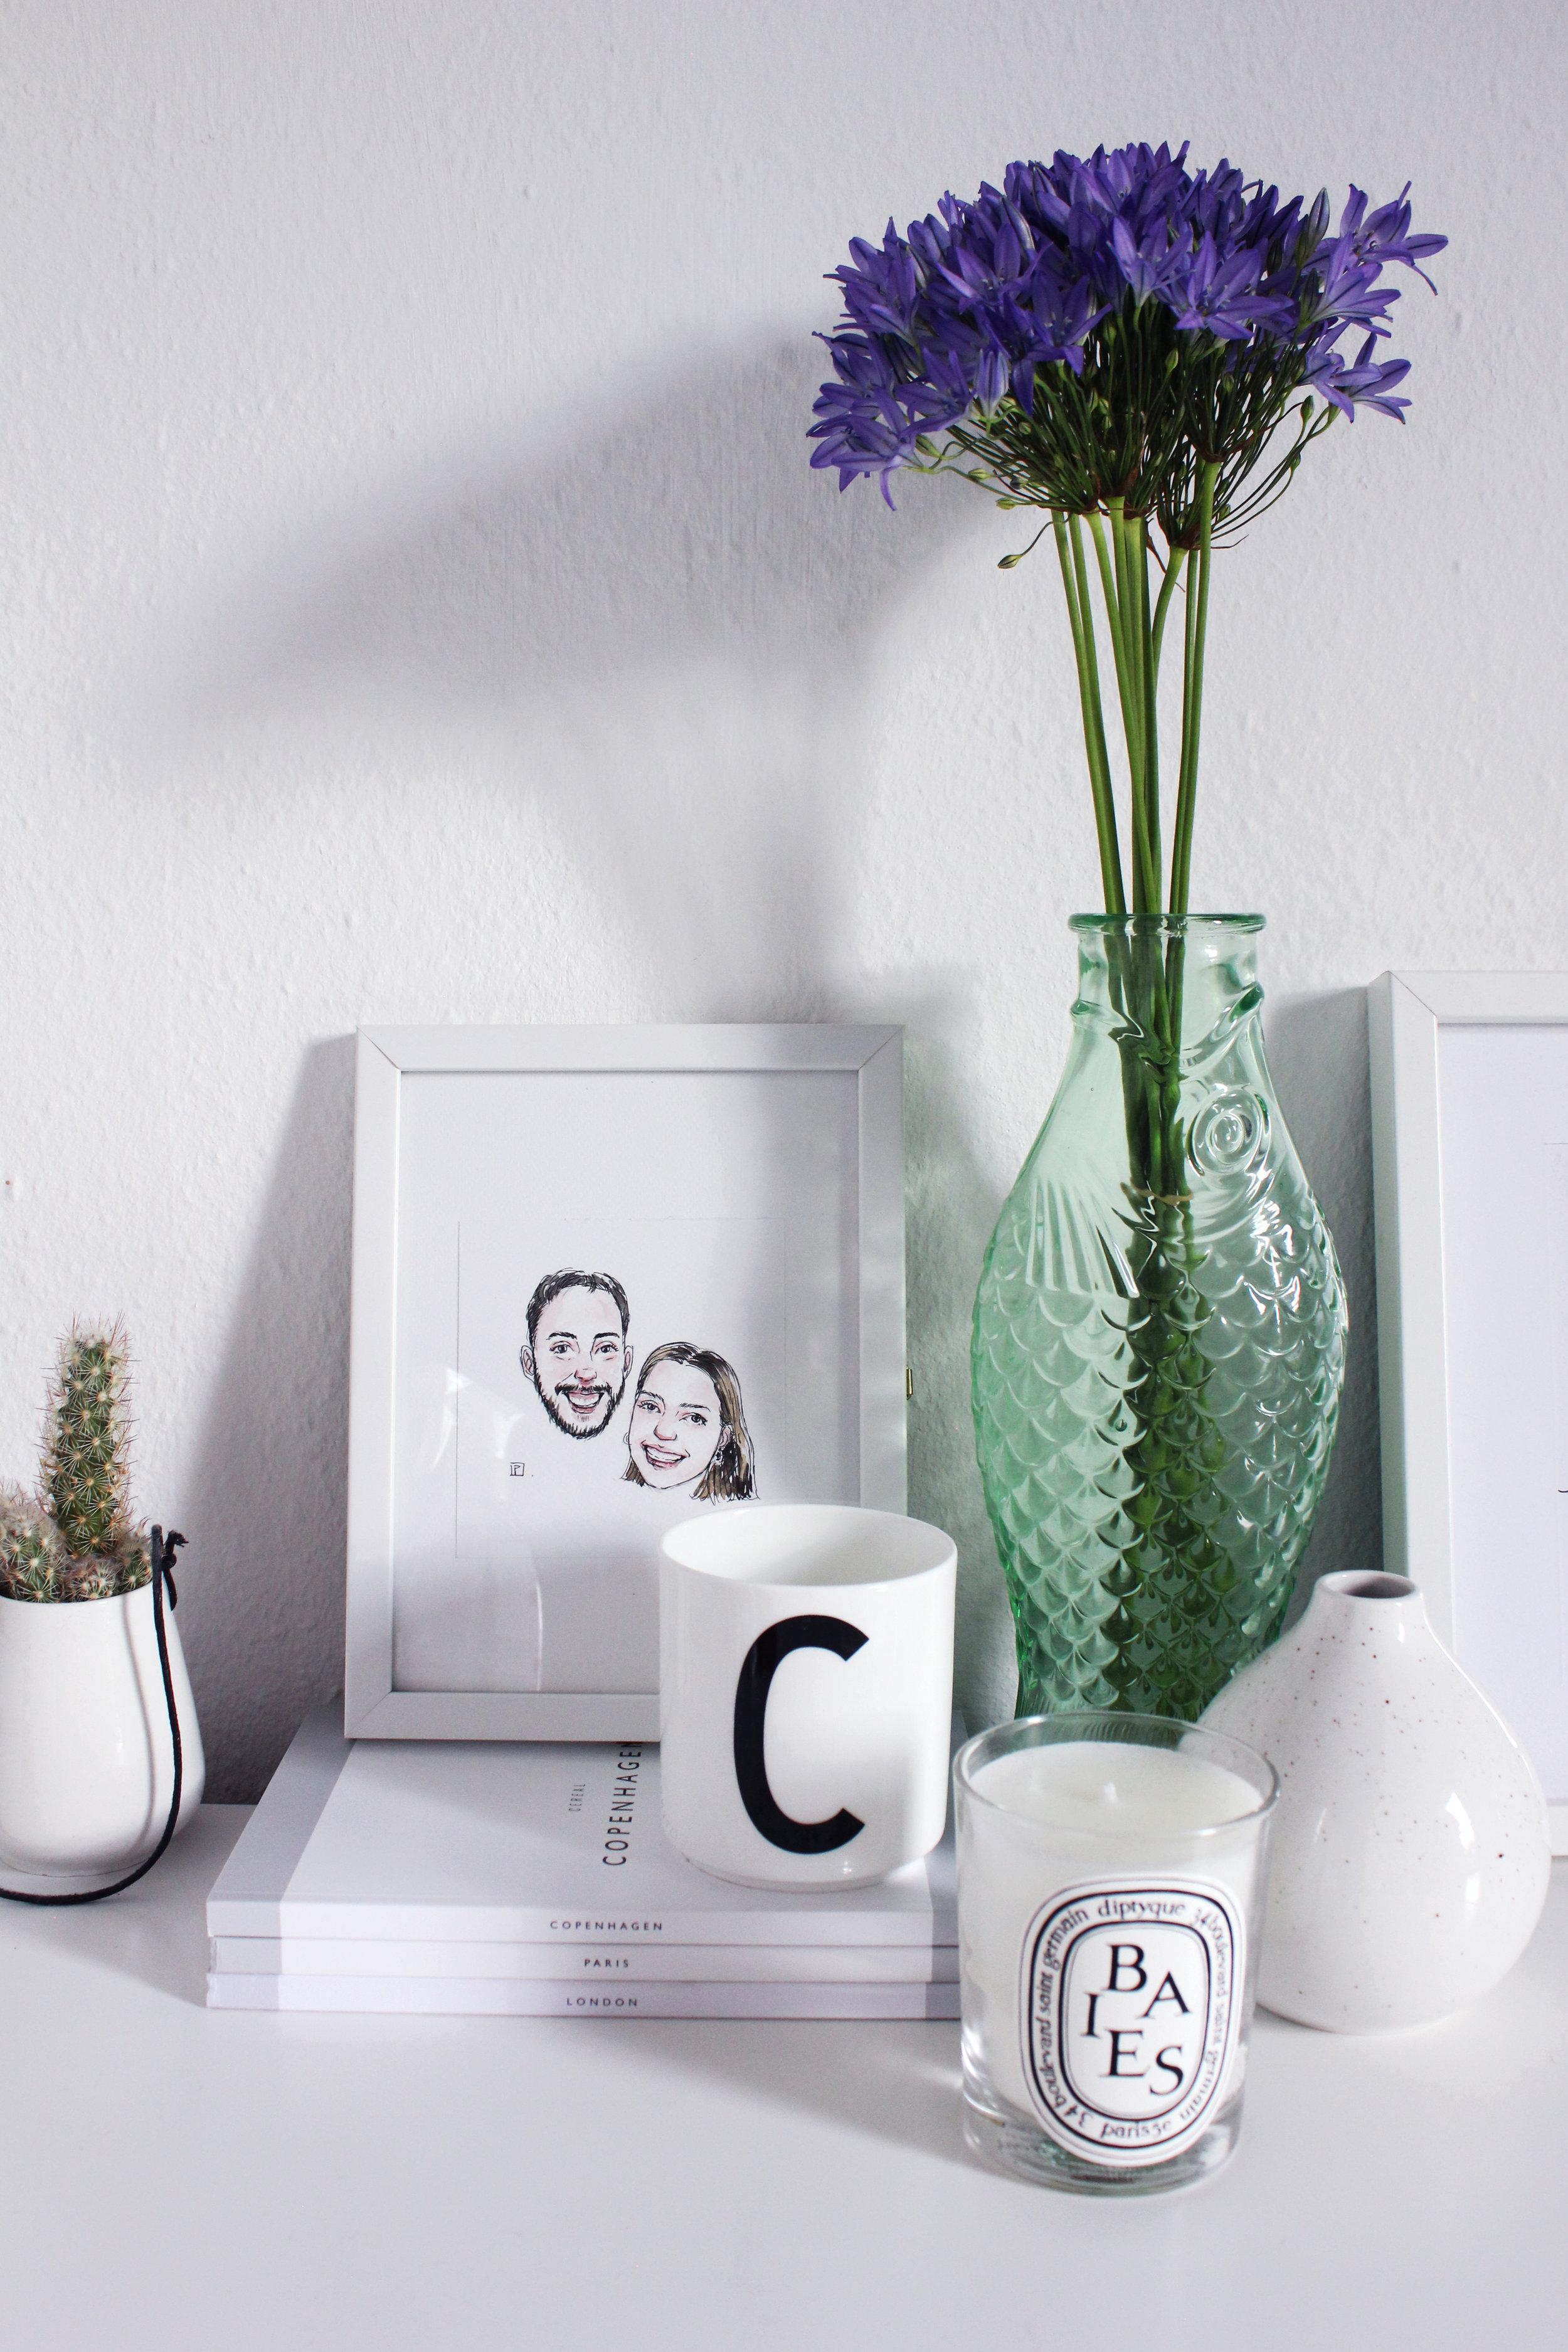 Callie-Pettigrew-Home-Styling-30.jpg